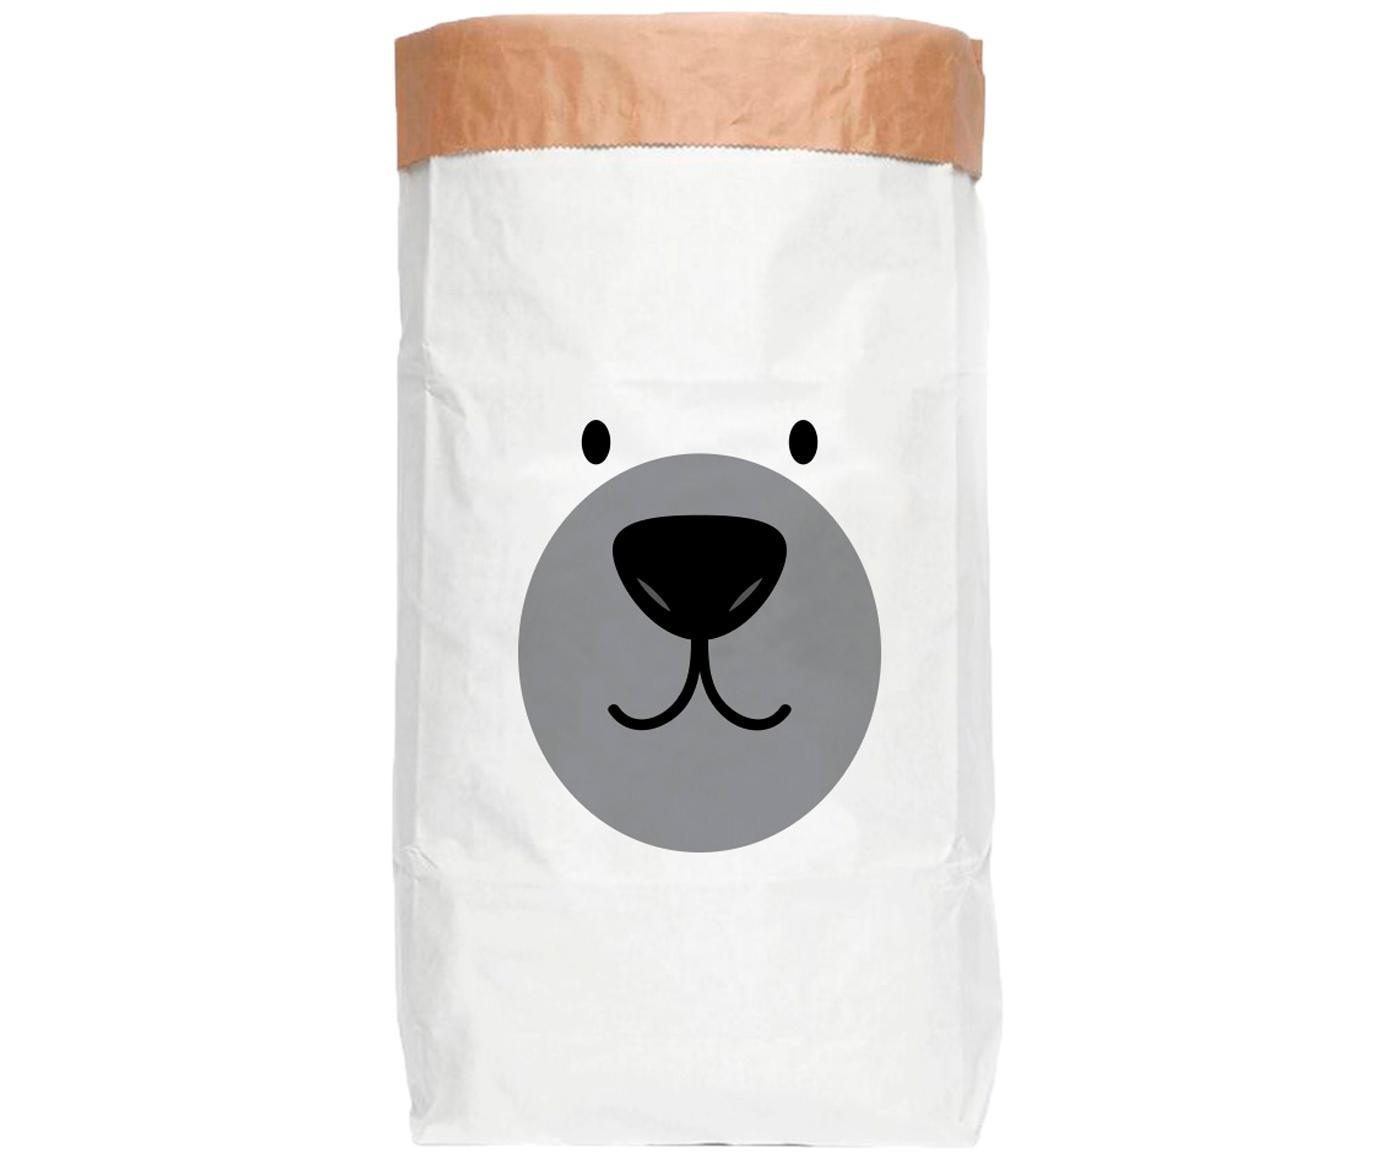 Bolsa de almacenaje Bear, Papel reciclado, Blanco, negro, gris, An 60 x Al 90 cm